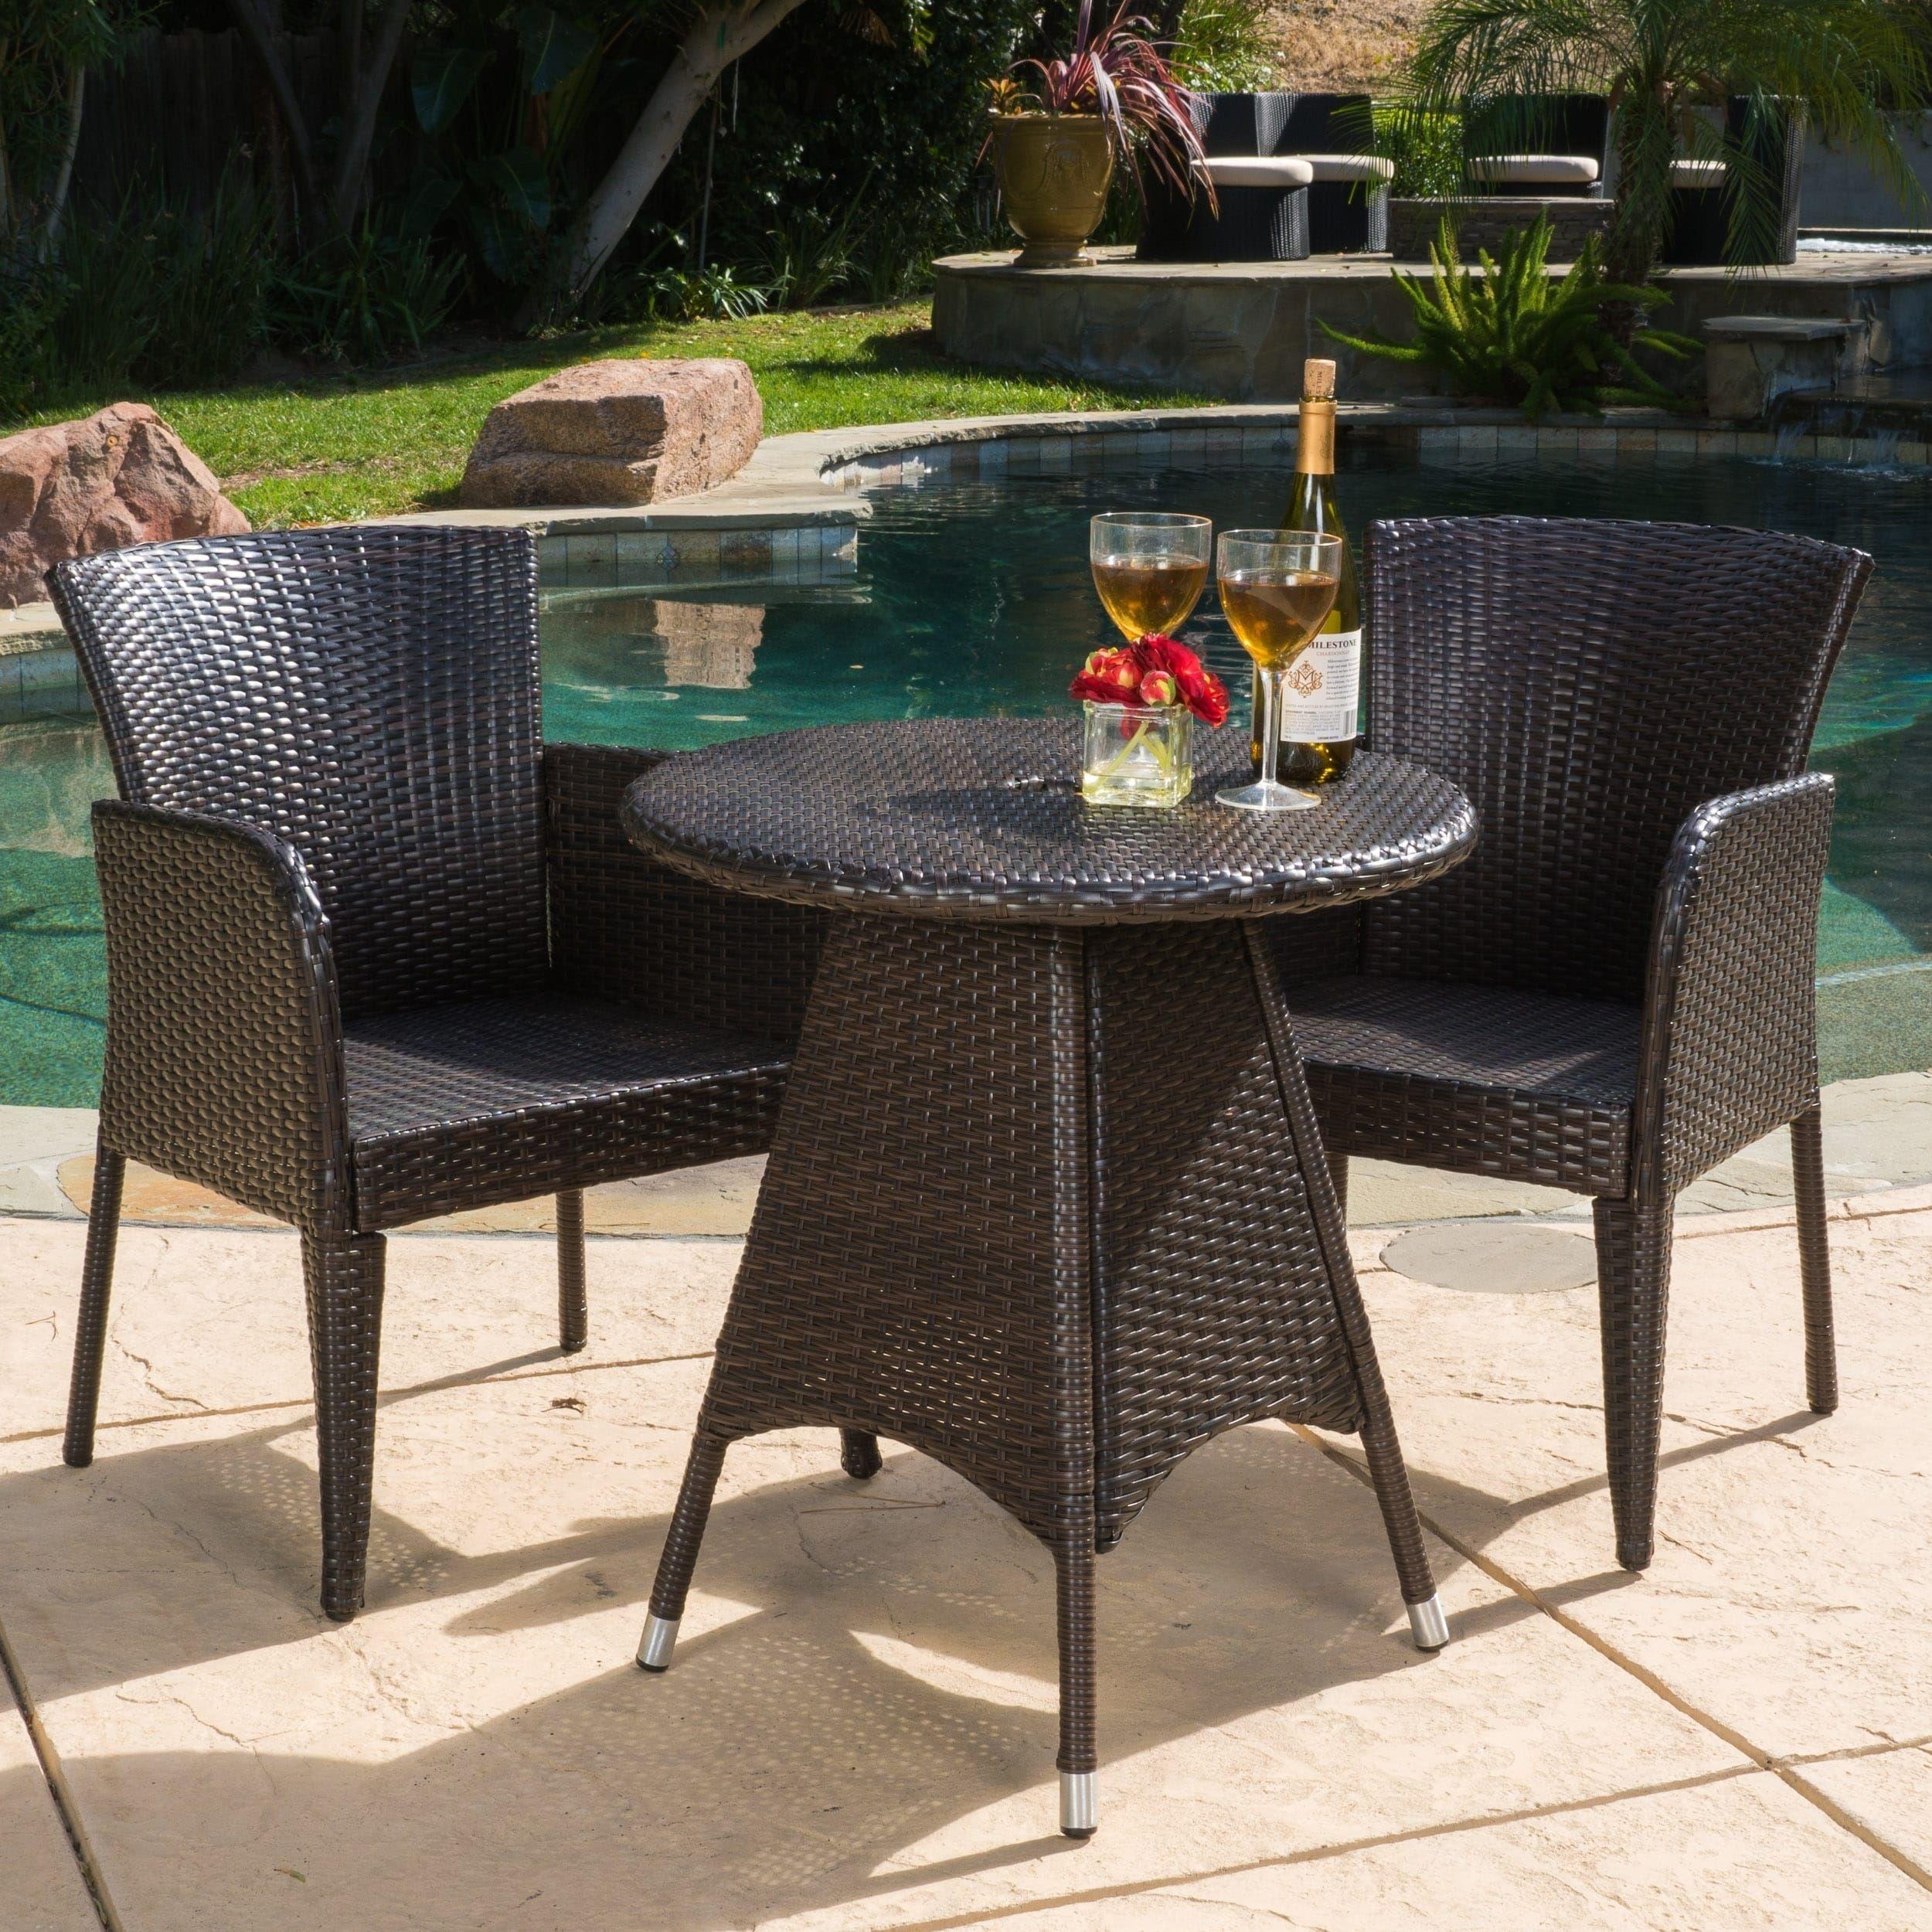 Brayden Outdoor 3 Piece Wicker Bistro Set By Christopher Knight Home Iron Brown Patio Furniture